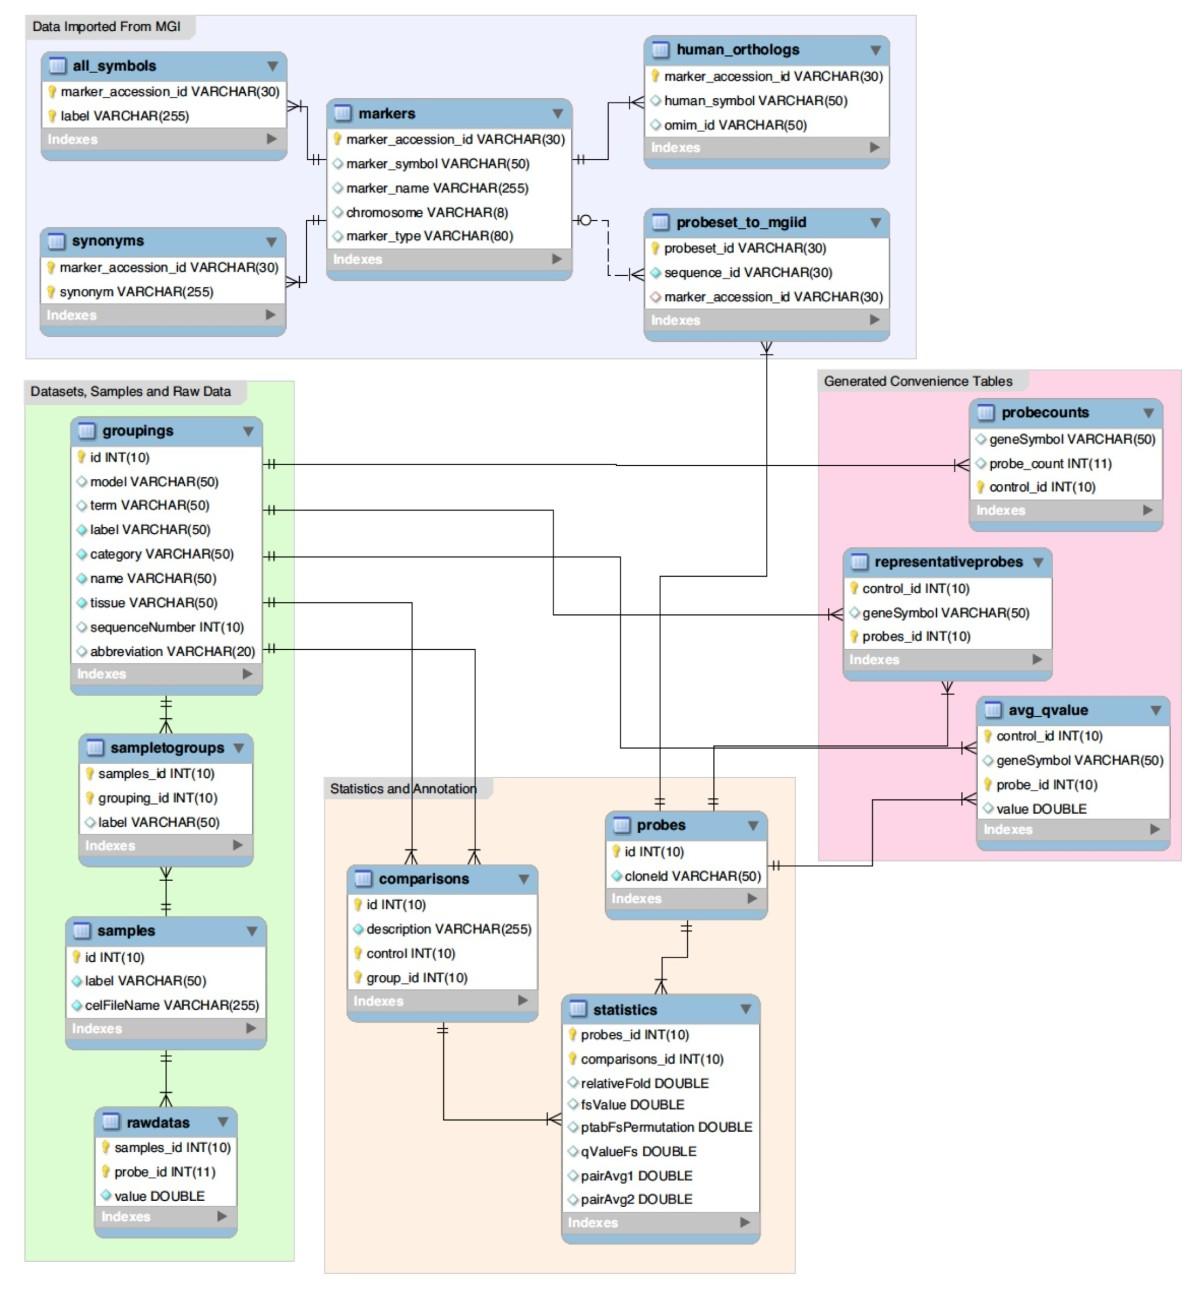 https://static-content.springer.com/image/art%3A10.1186%2F1471-2164-12-429/MediaObjects/12864_2011_3565_Fig2_HTML.jpg